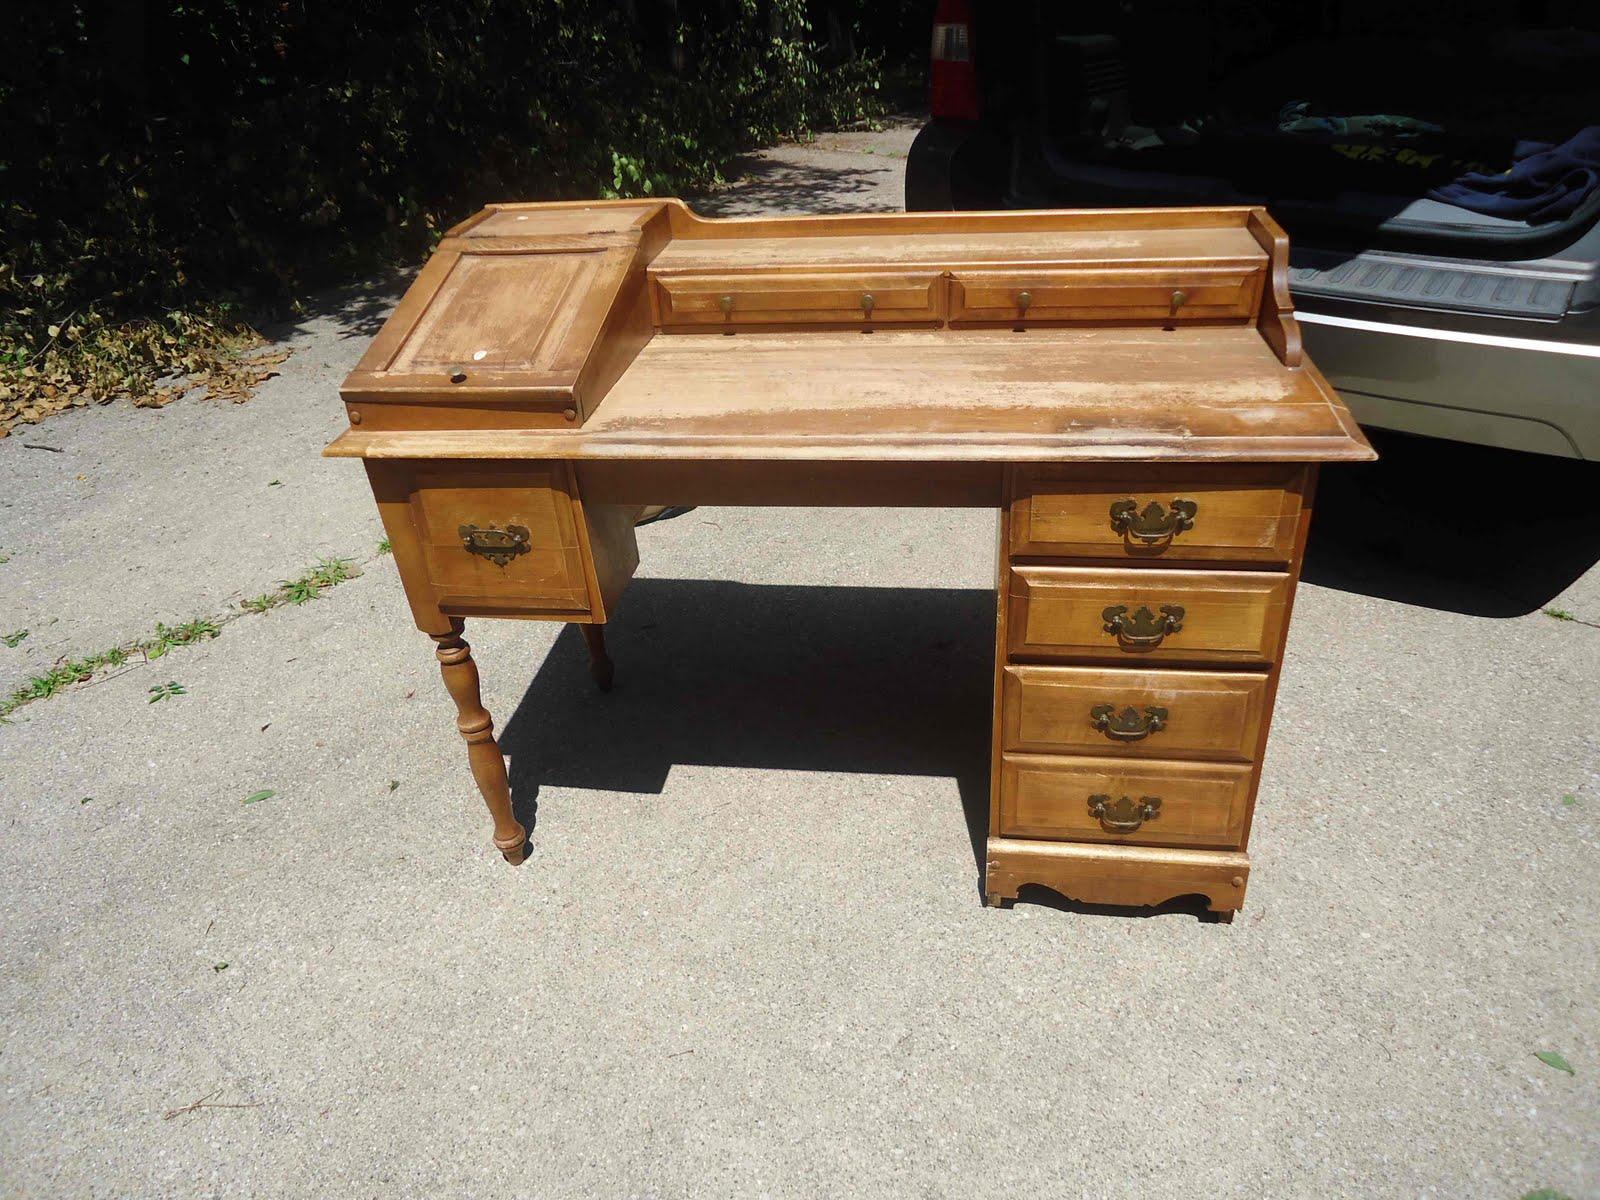 Domesticated Nomad Craigslist Desk